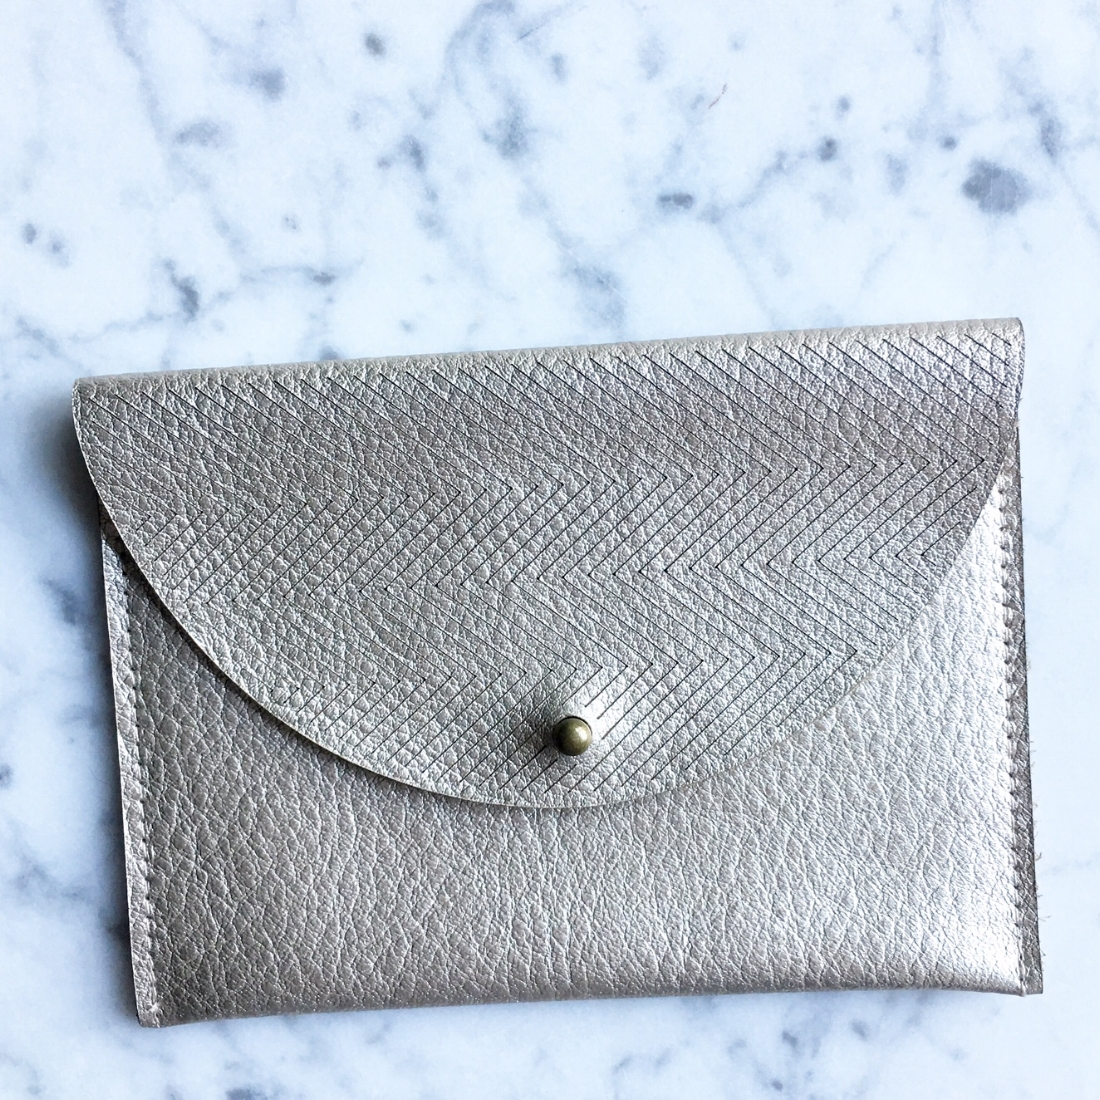 Just the Basics Platinum Wallet